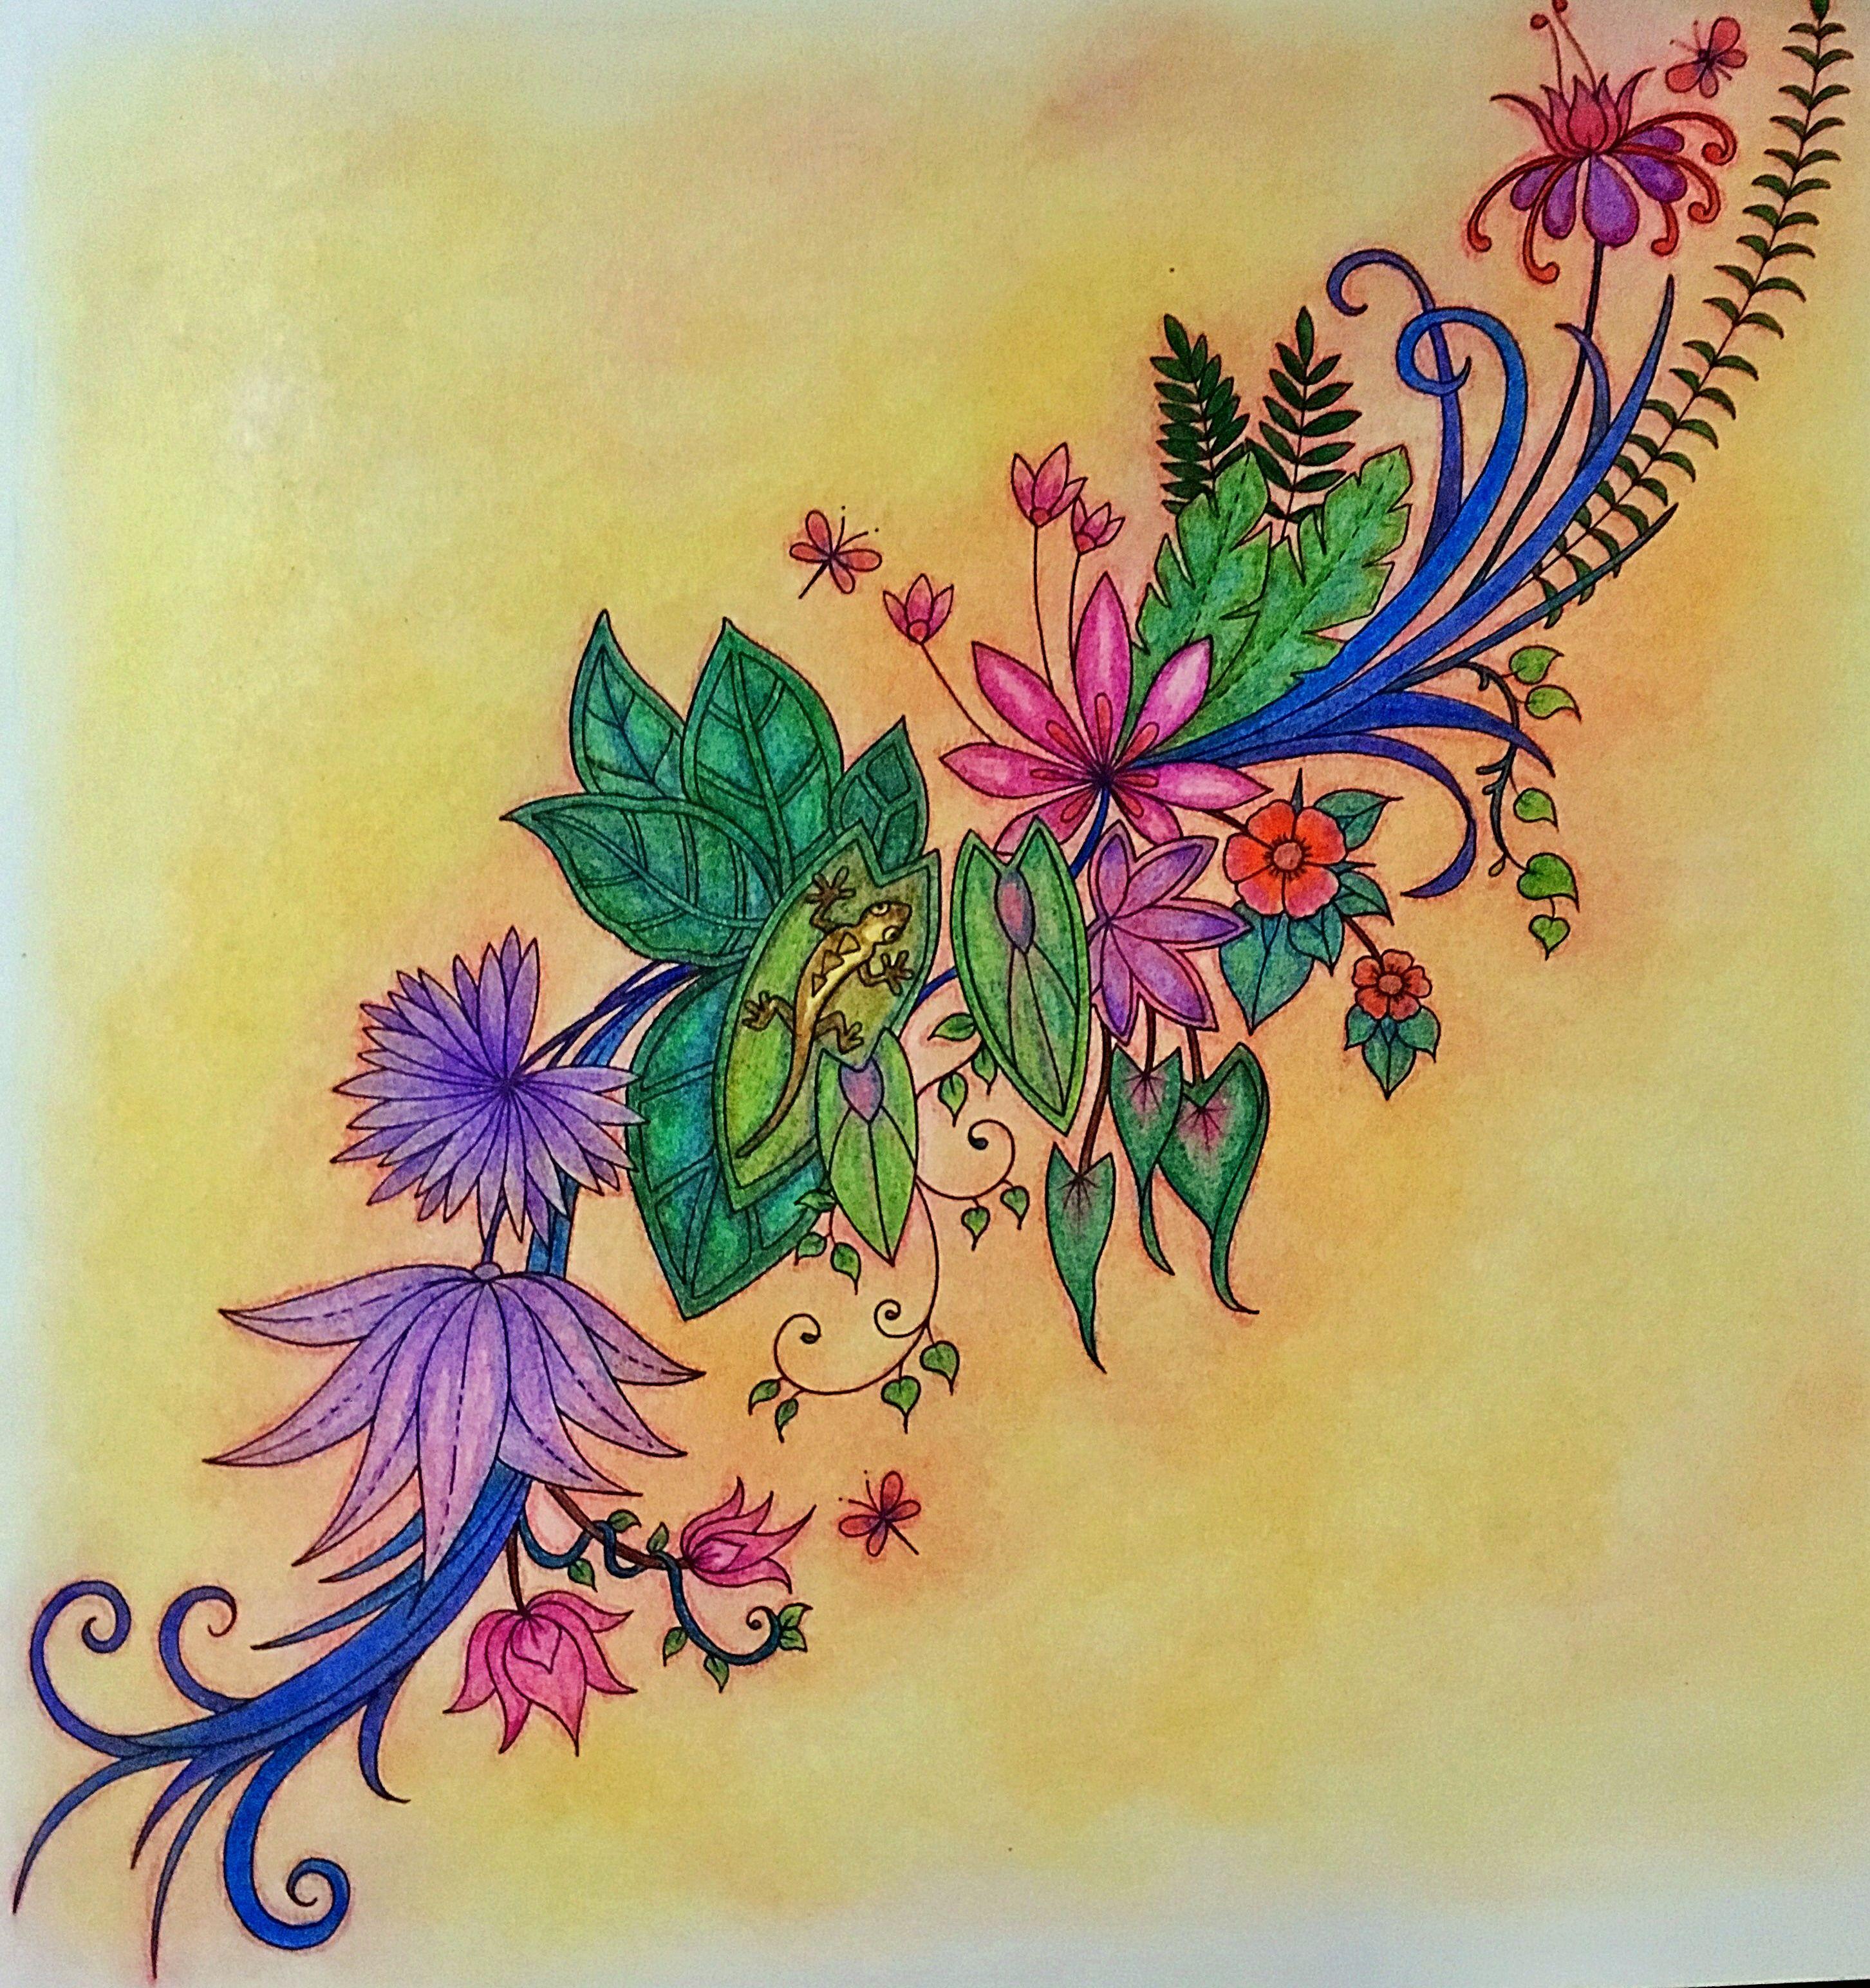 magical jungle johanna basford coloring books pinterest